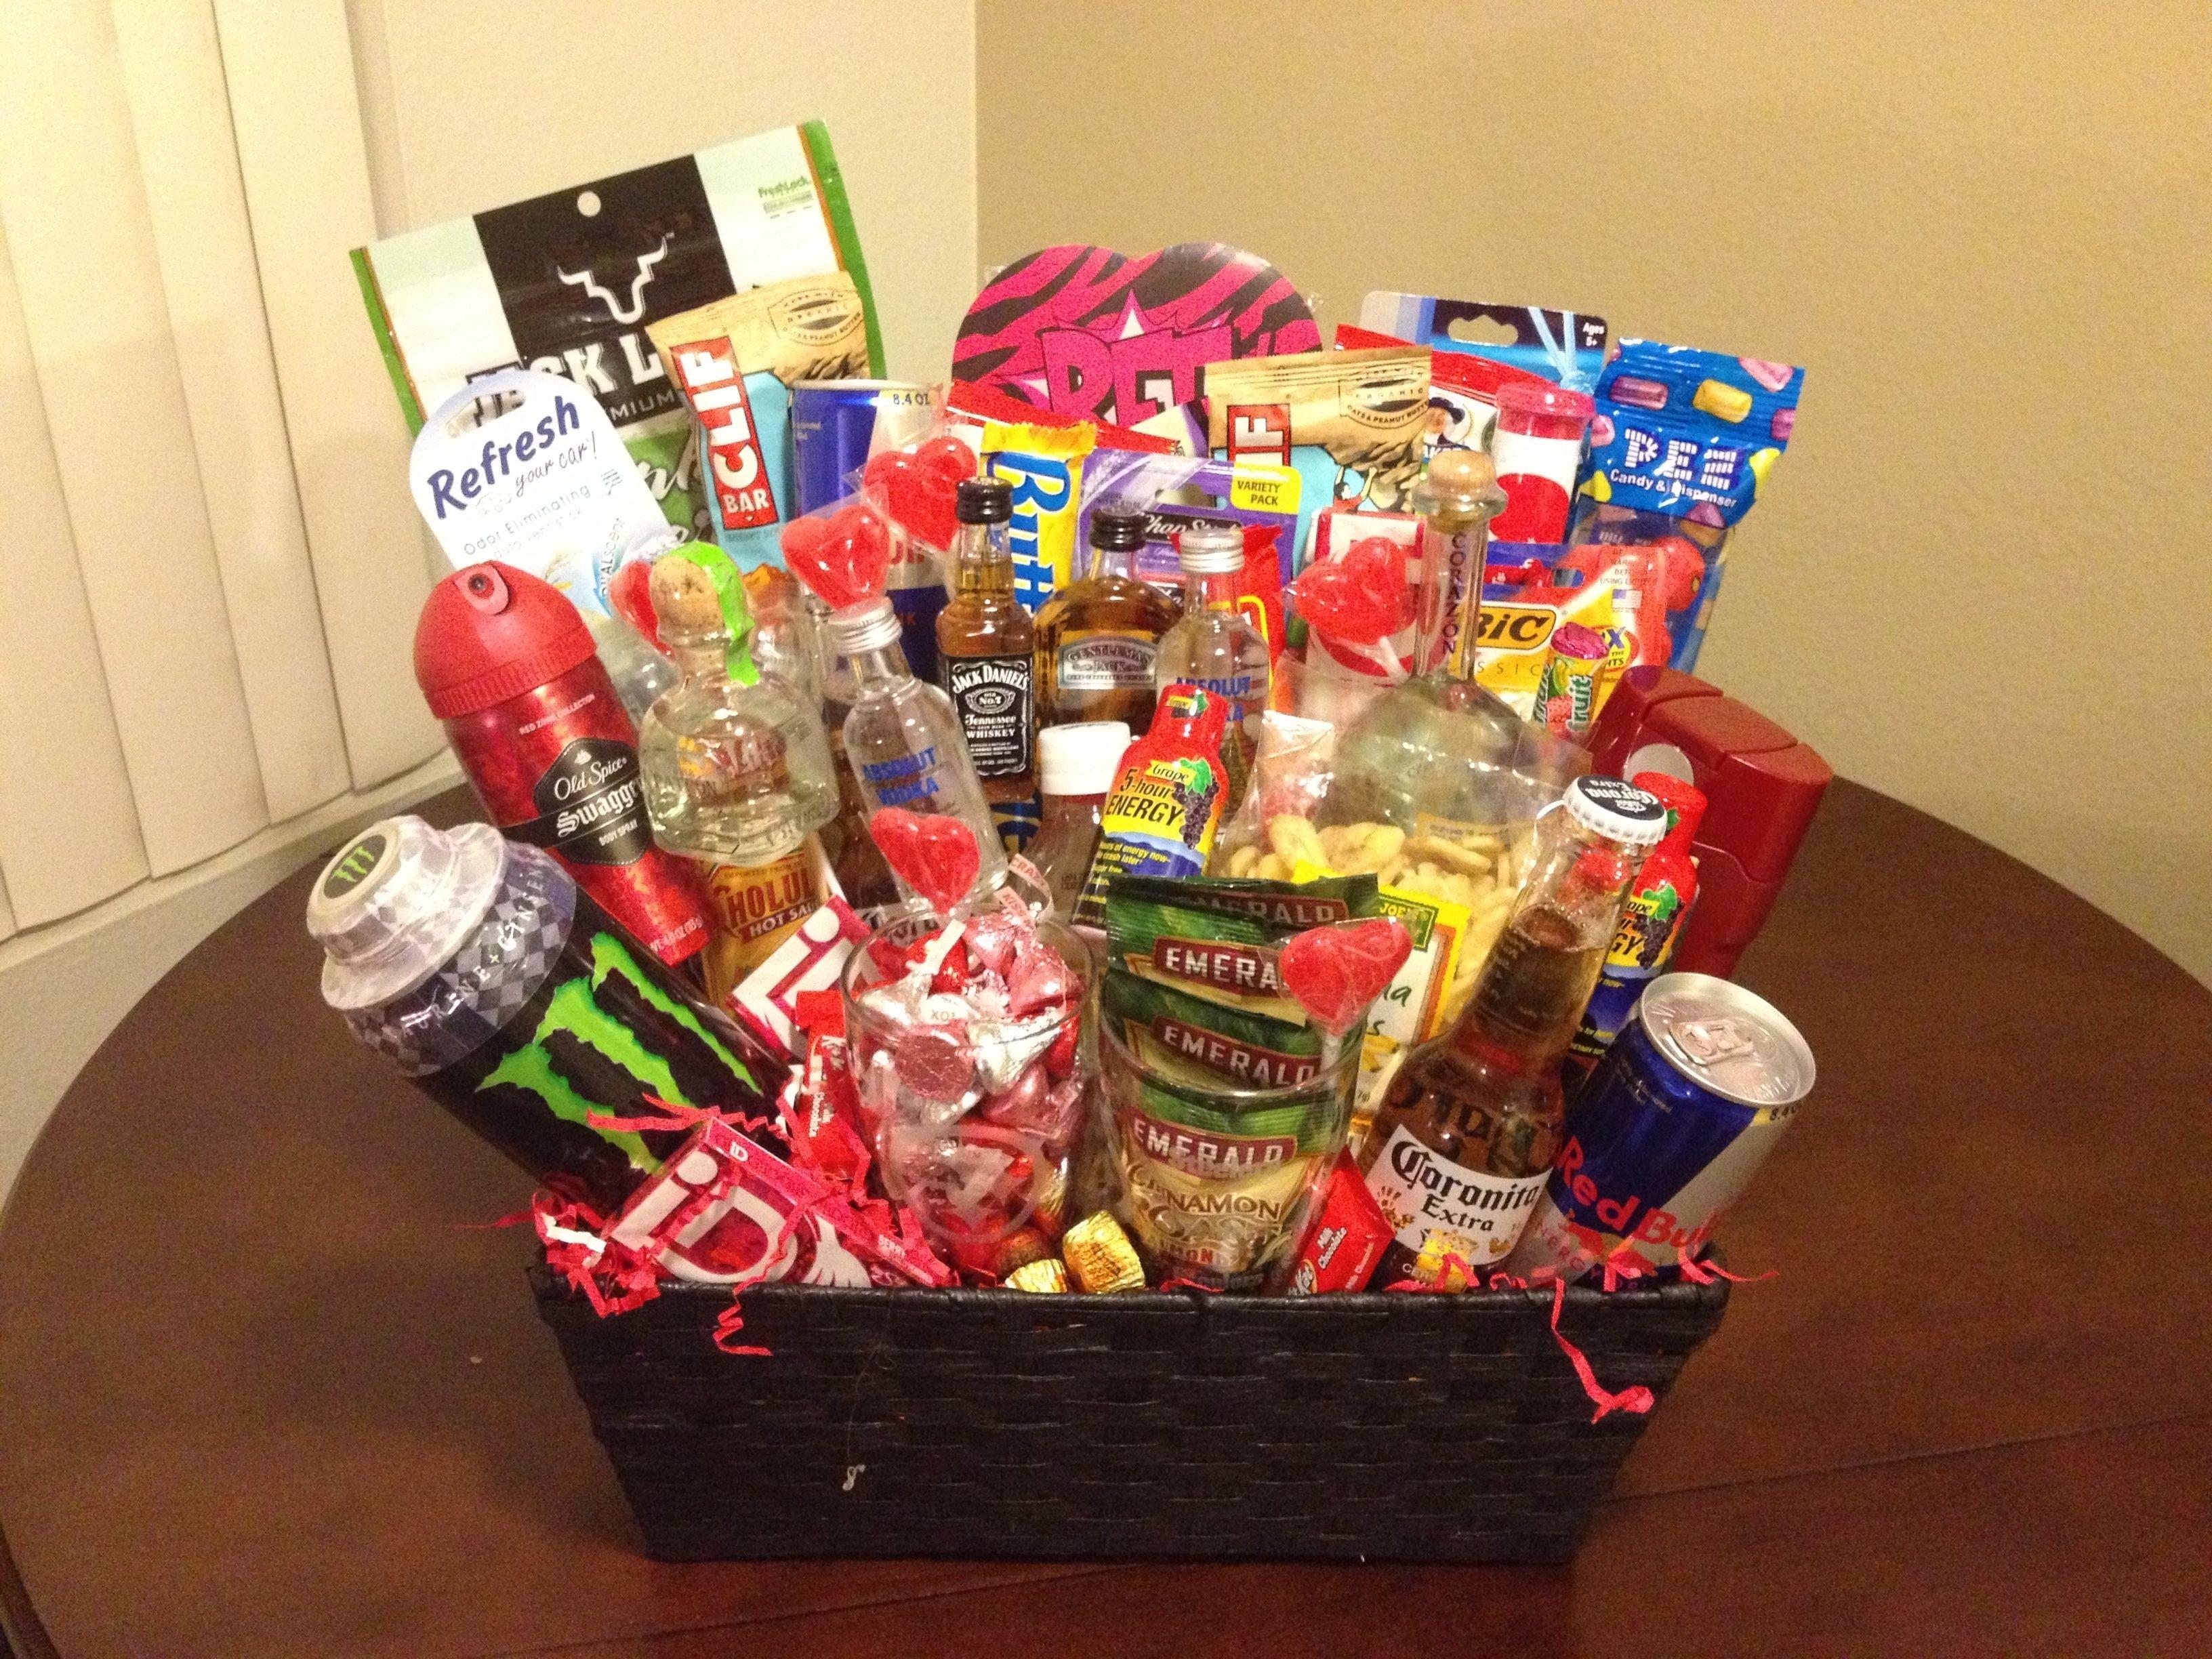 10 Cute Gift Baskets For Men Ideas man basket diy pinterest man basket easter and gift 1 2020